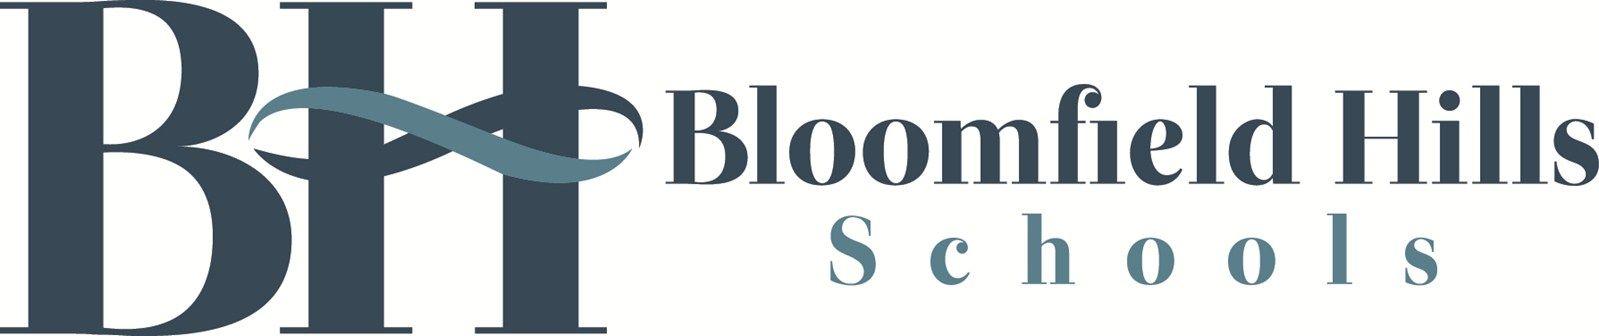 Logo of Bloomfield Hills Schools